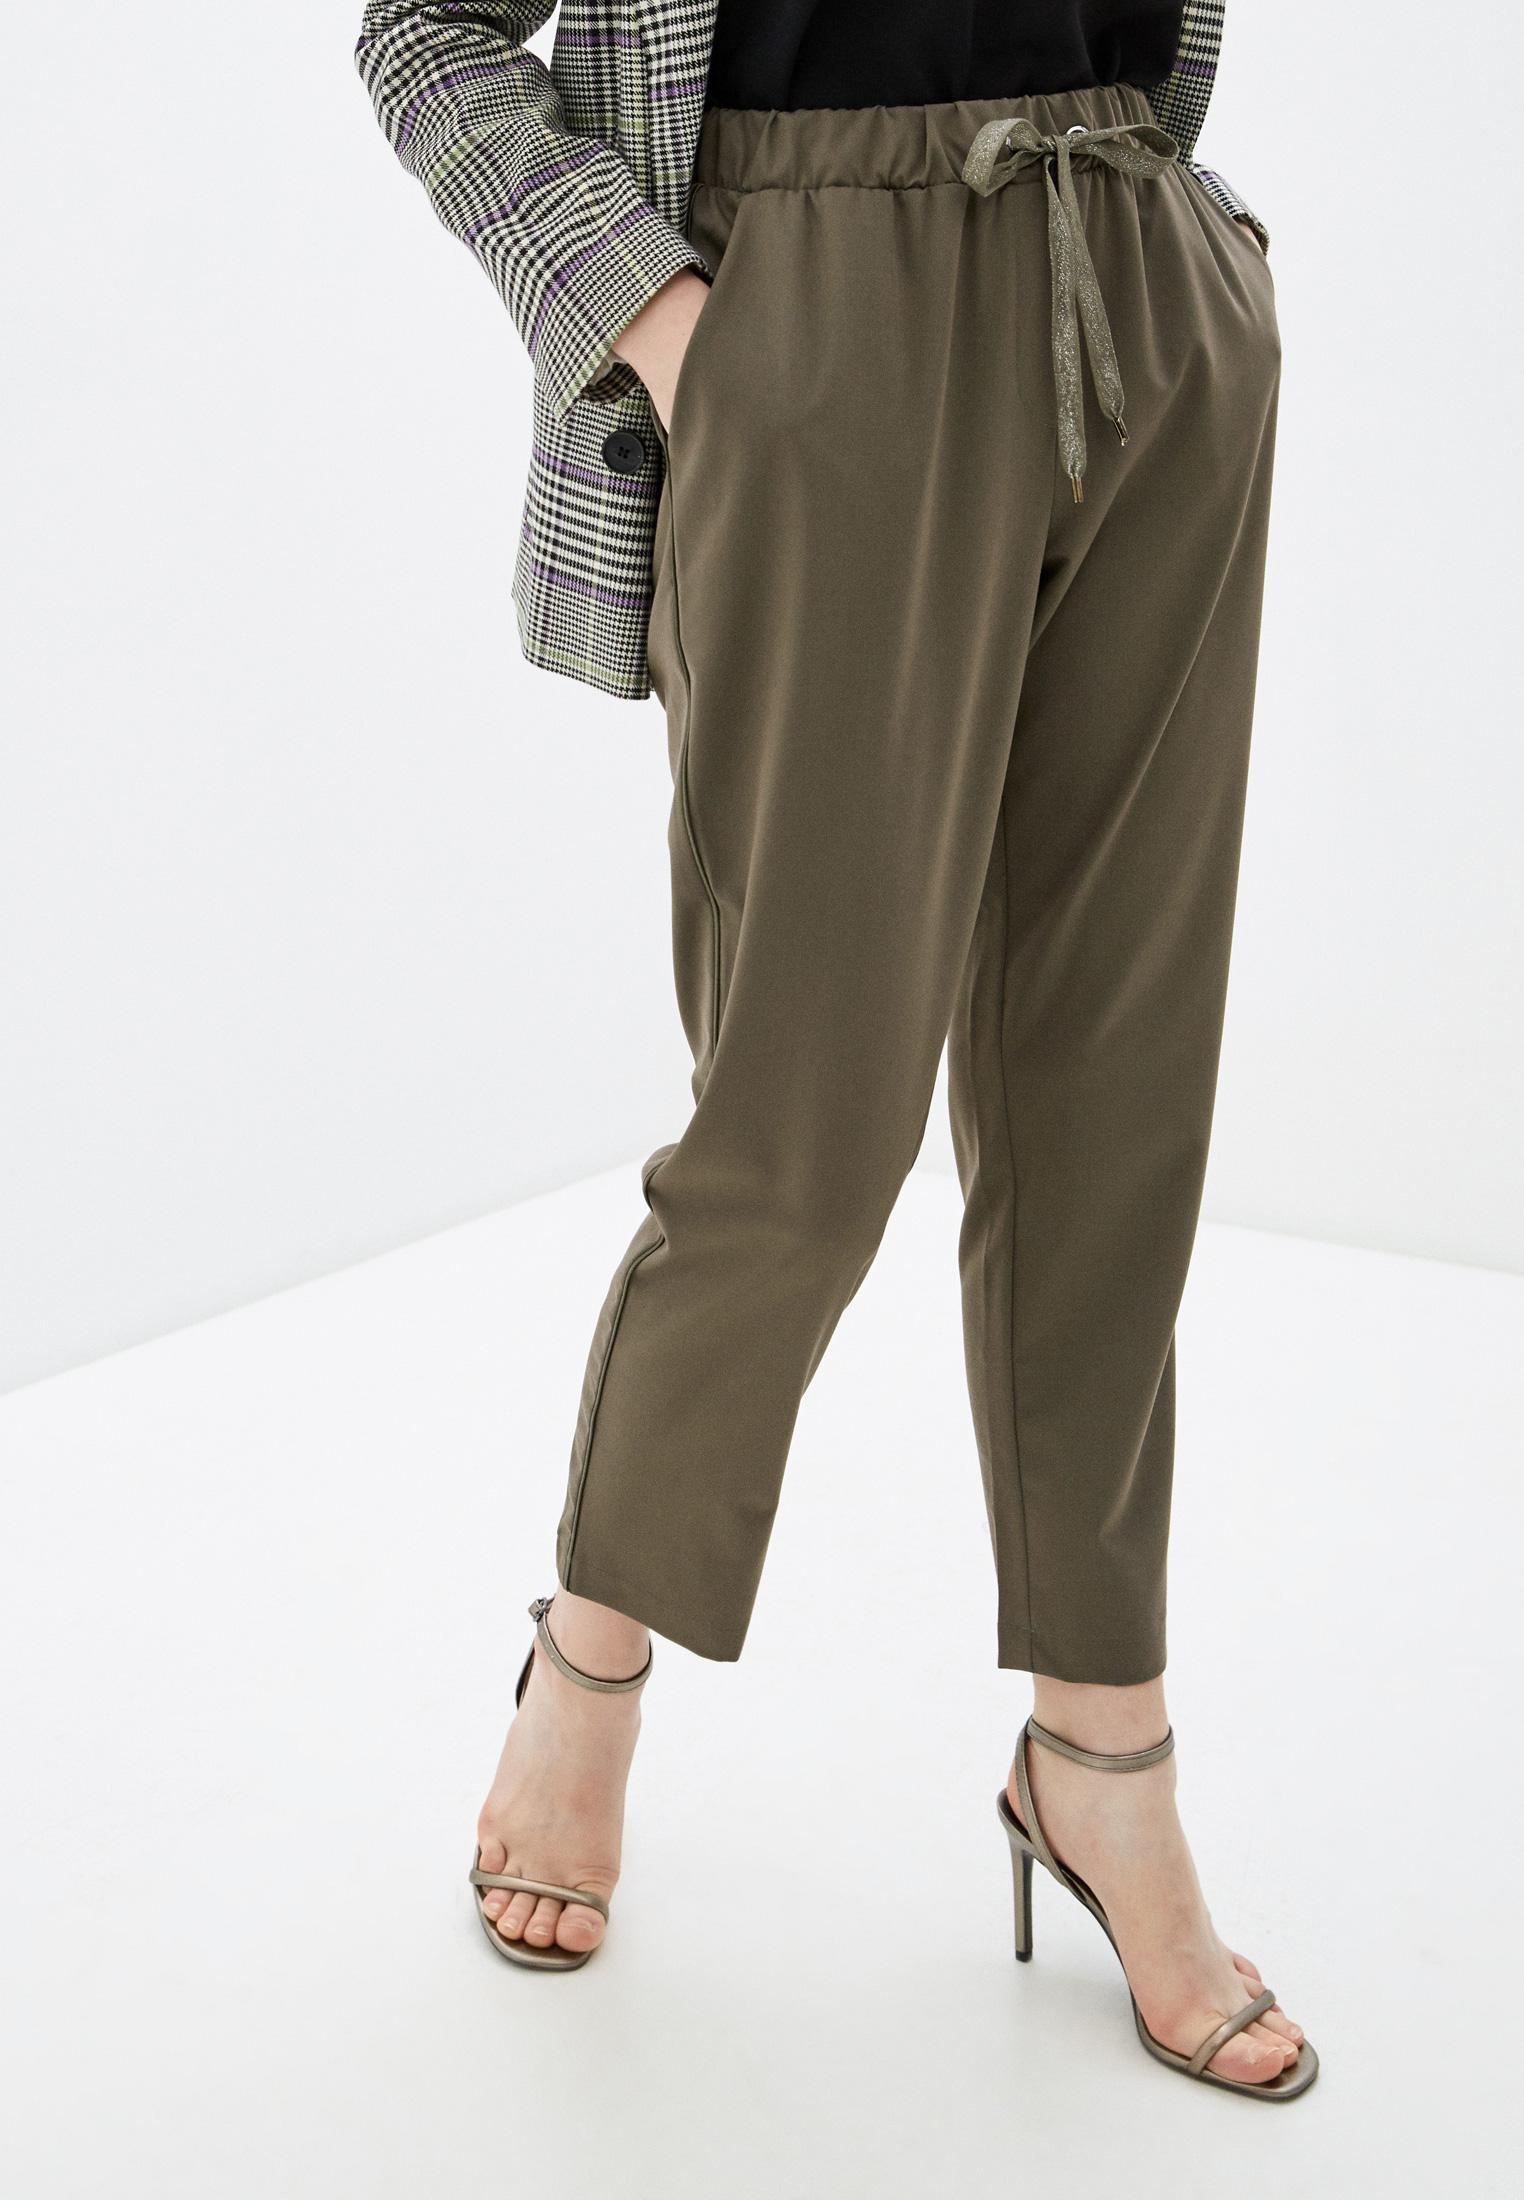 модные женские брюки фото характер